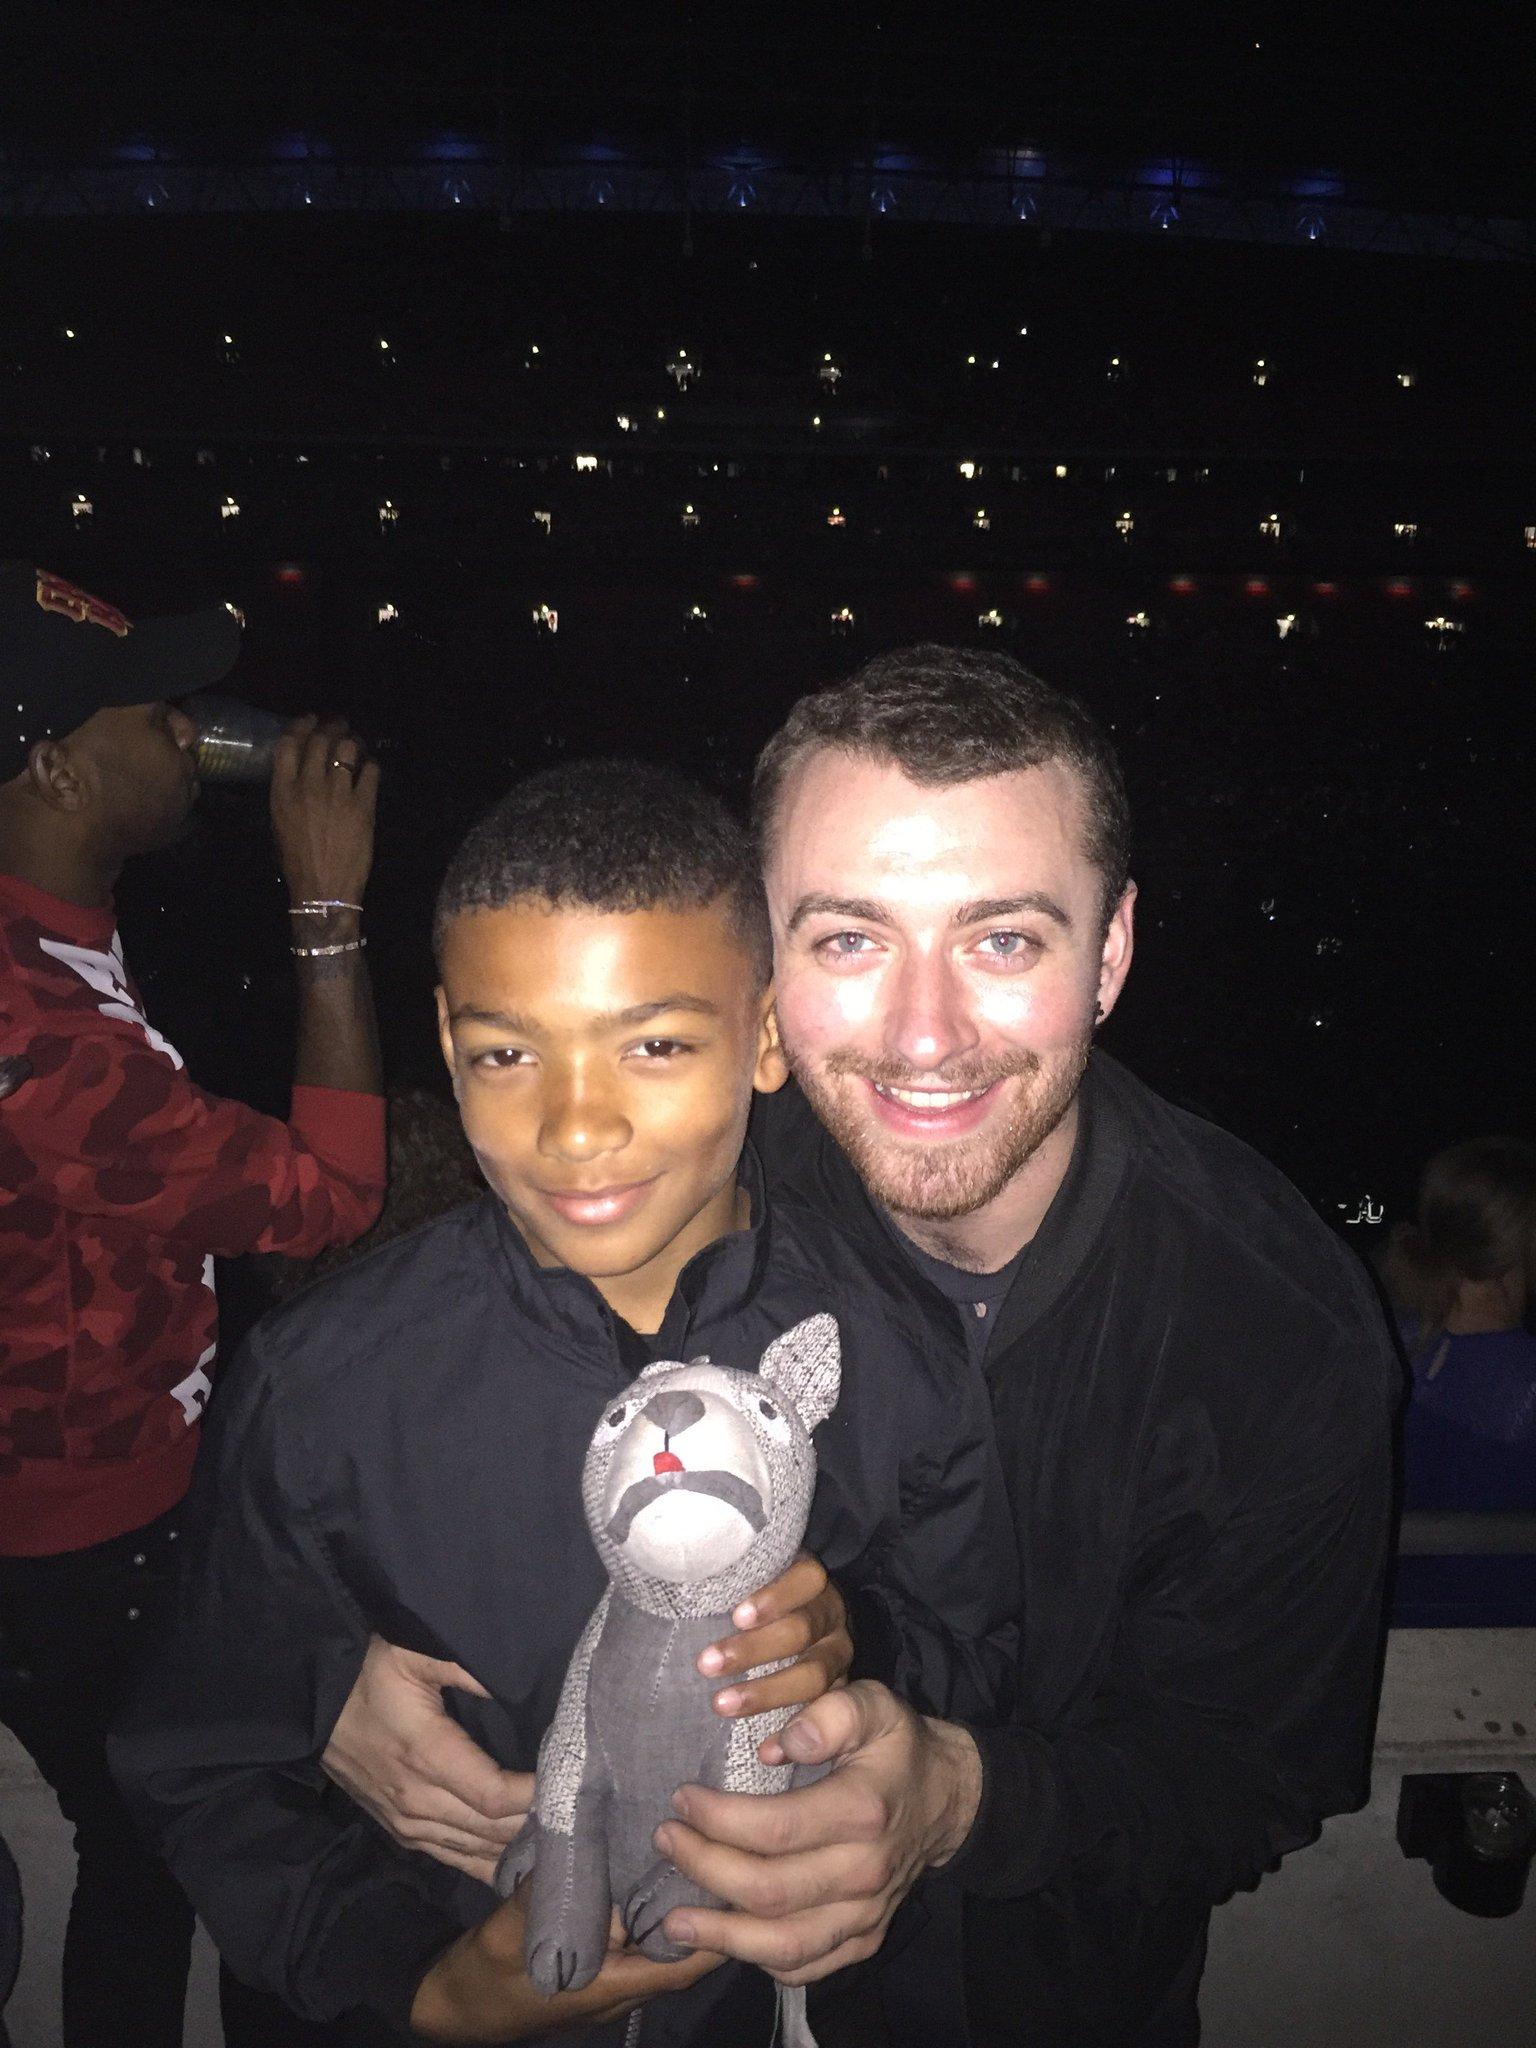 Gr8 Night   @wembleystadium  for Rhianna. Tyler got to meet Sam Smith and Phoenix got to meet his dad @disclosure https://t.co/aX6XRZvFWu